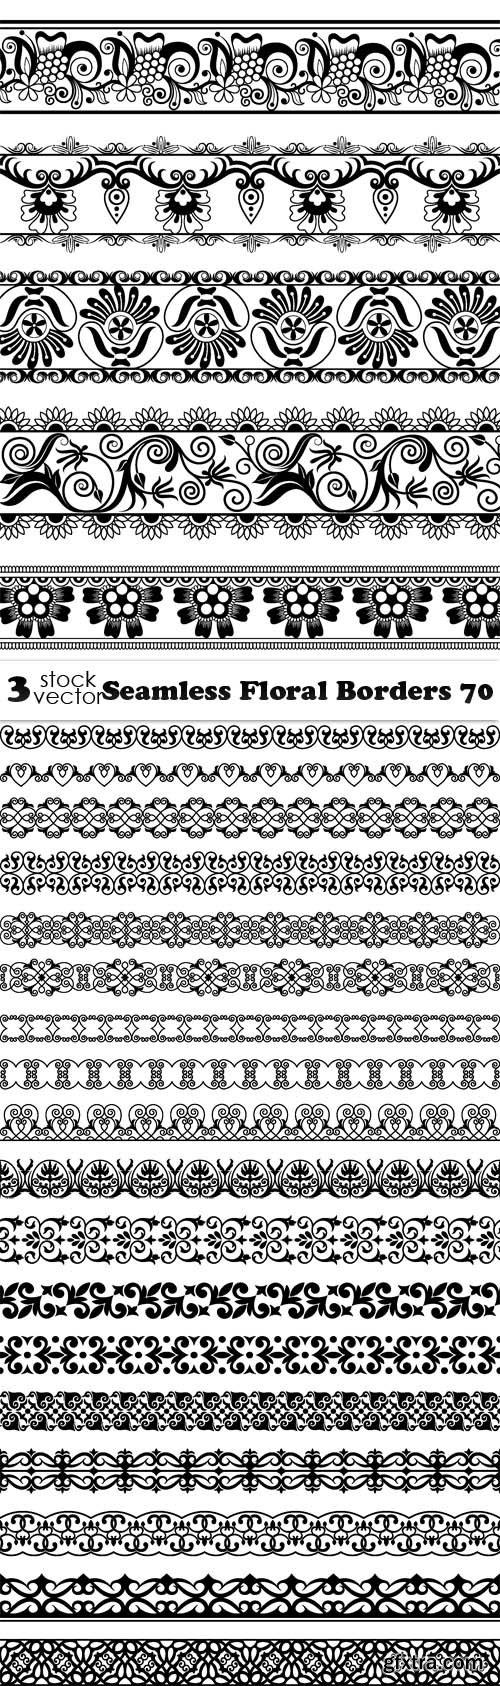 Vectors - Seamless Floral Borders 70